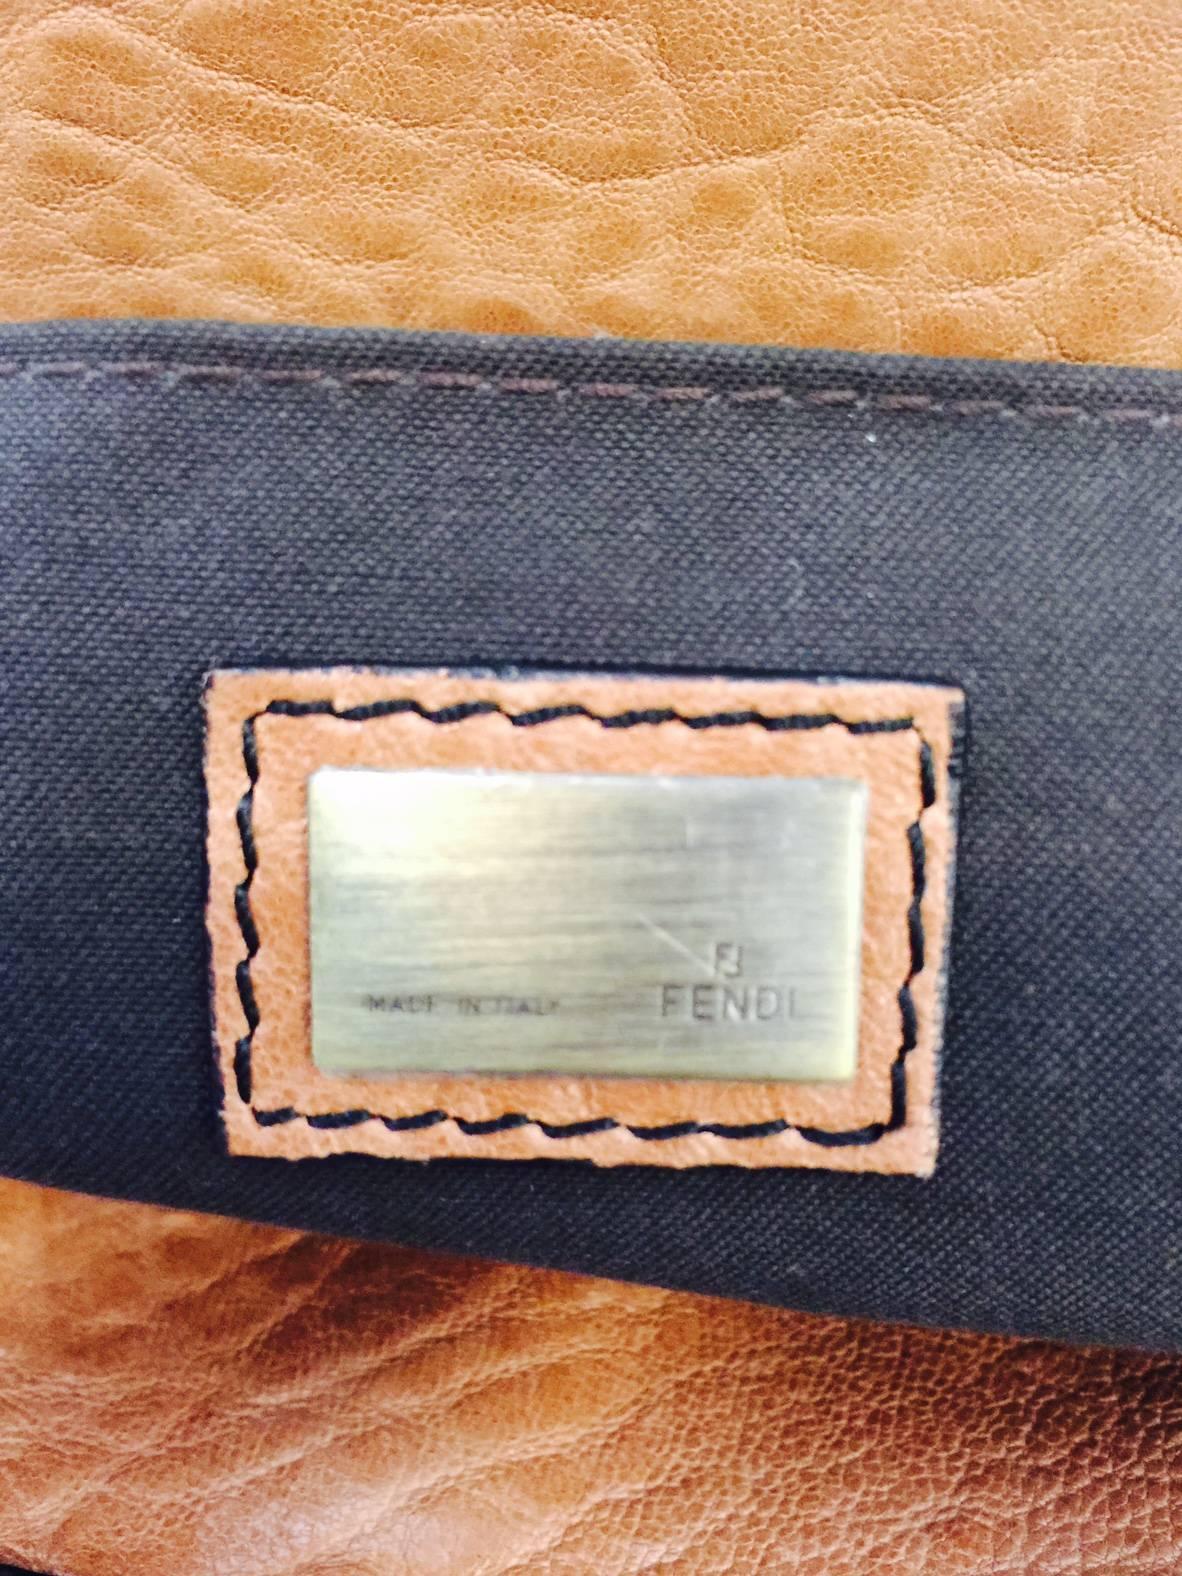 bc0186adb22e Fendi Tan Nappa Vernice Black Patent Leather B Bag Excellent Condition! For  Sale at 1stdibs